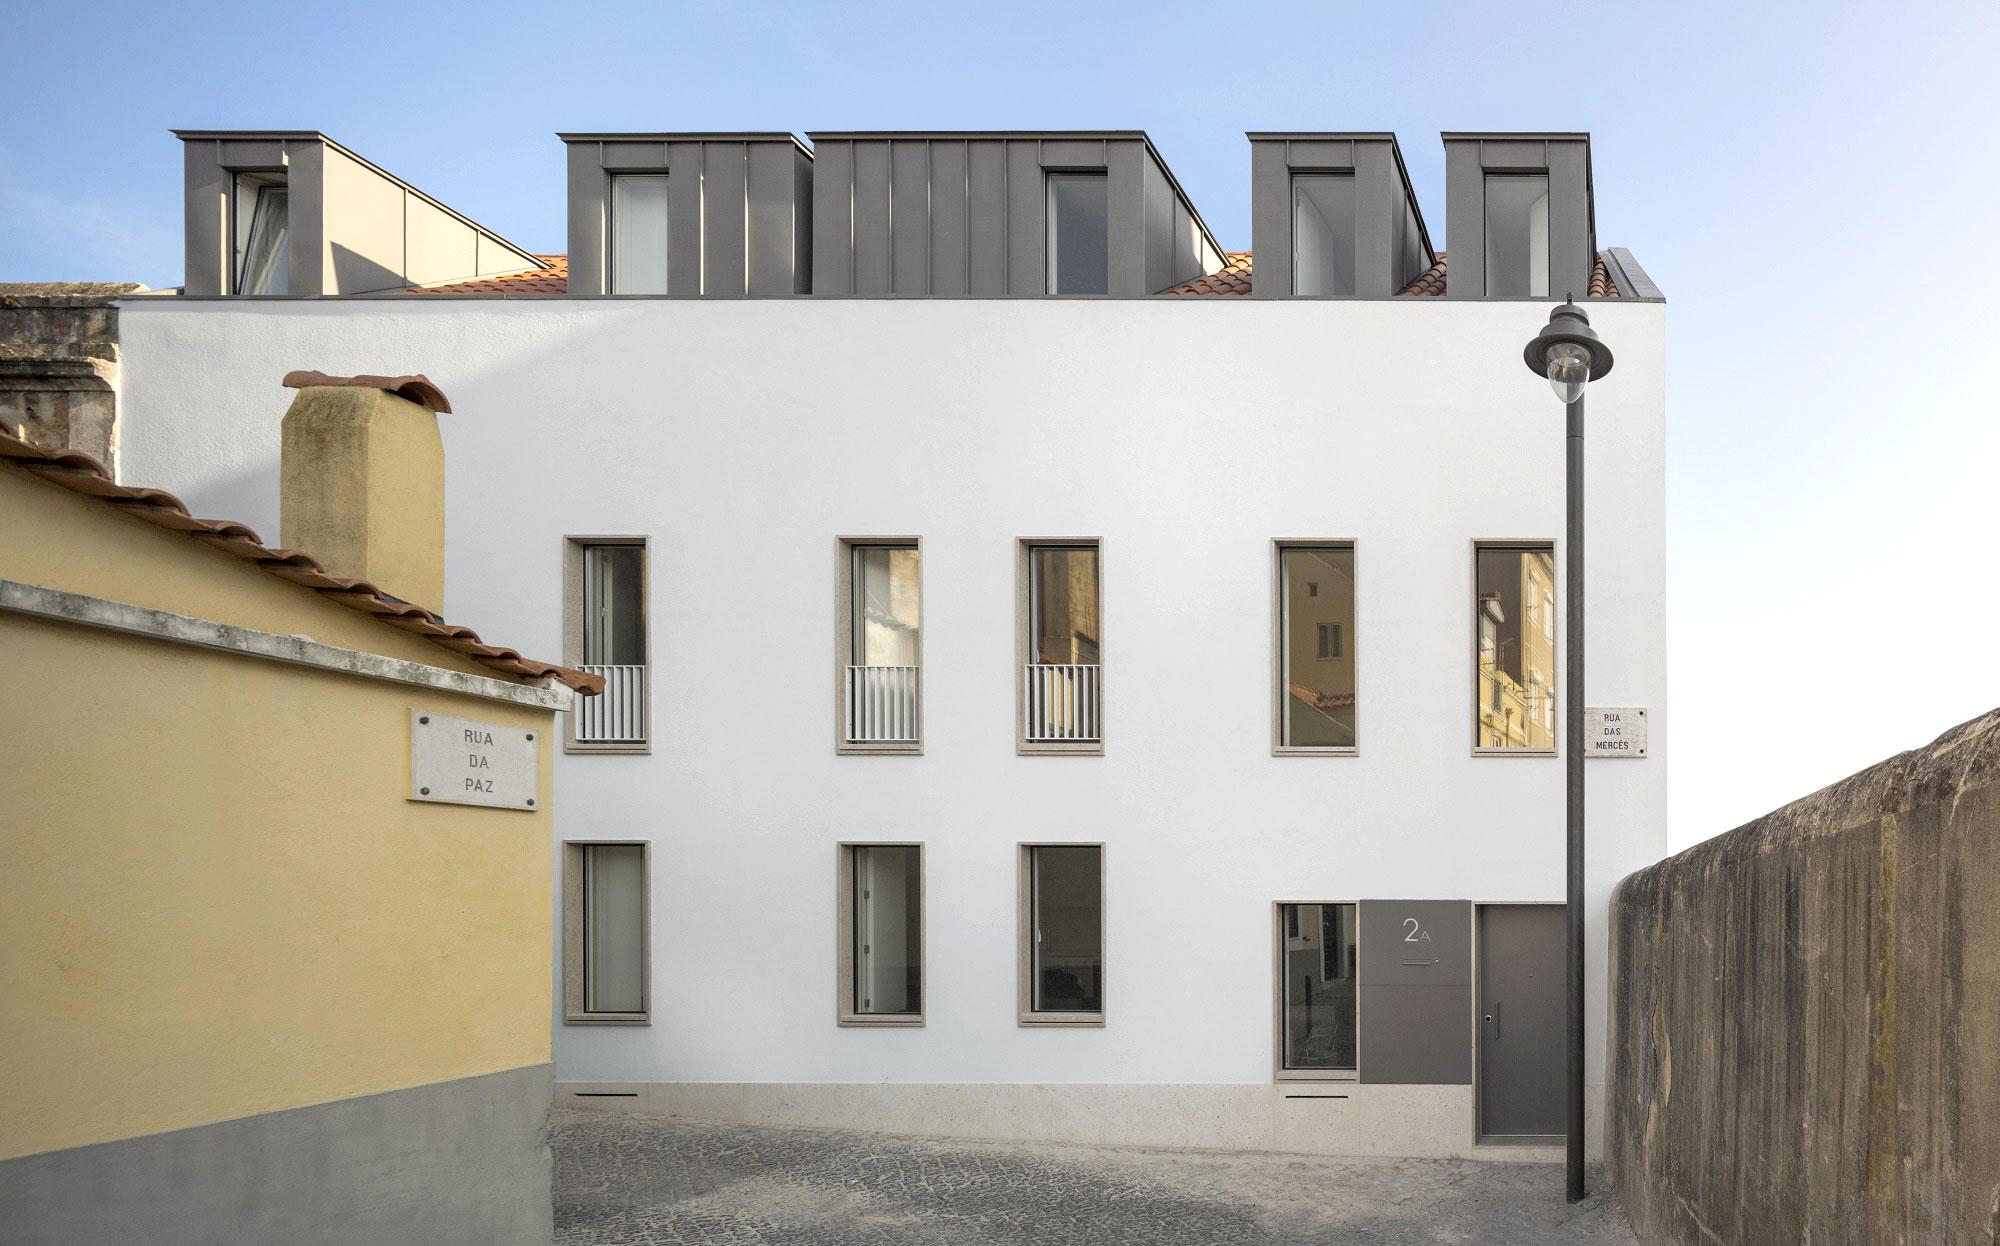 Edifício Arquitectura, Arquitecto Lisboa, Projecto arquitectura Lisboa, Arquitecto Lisboa, Arquitecto, Gabinete de Arquitetura Lisboa